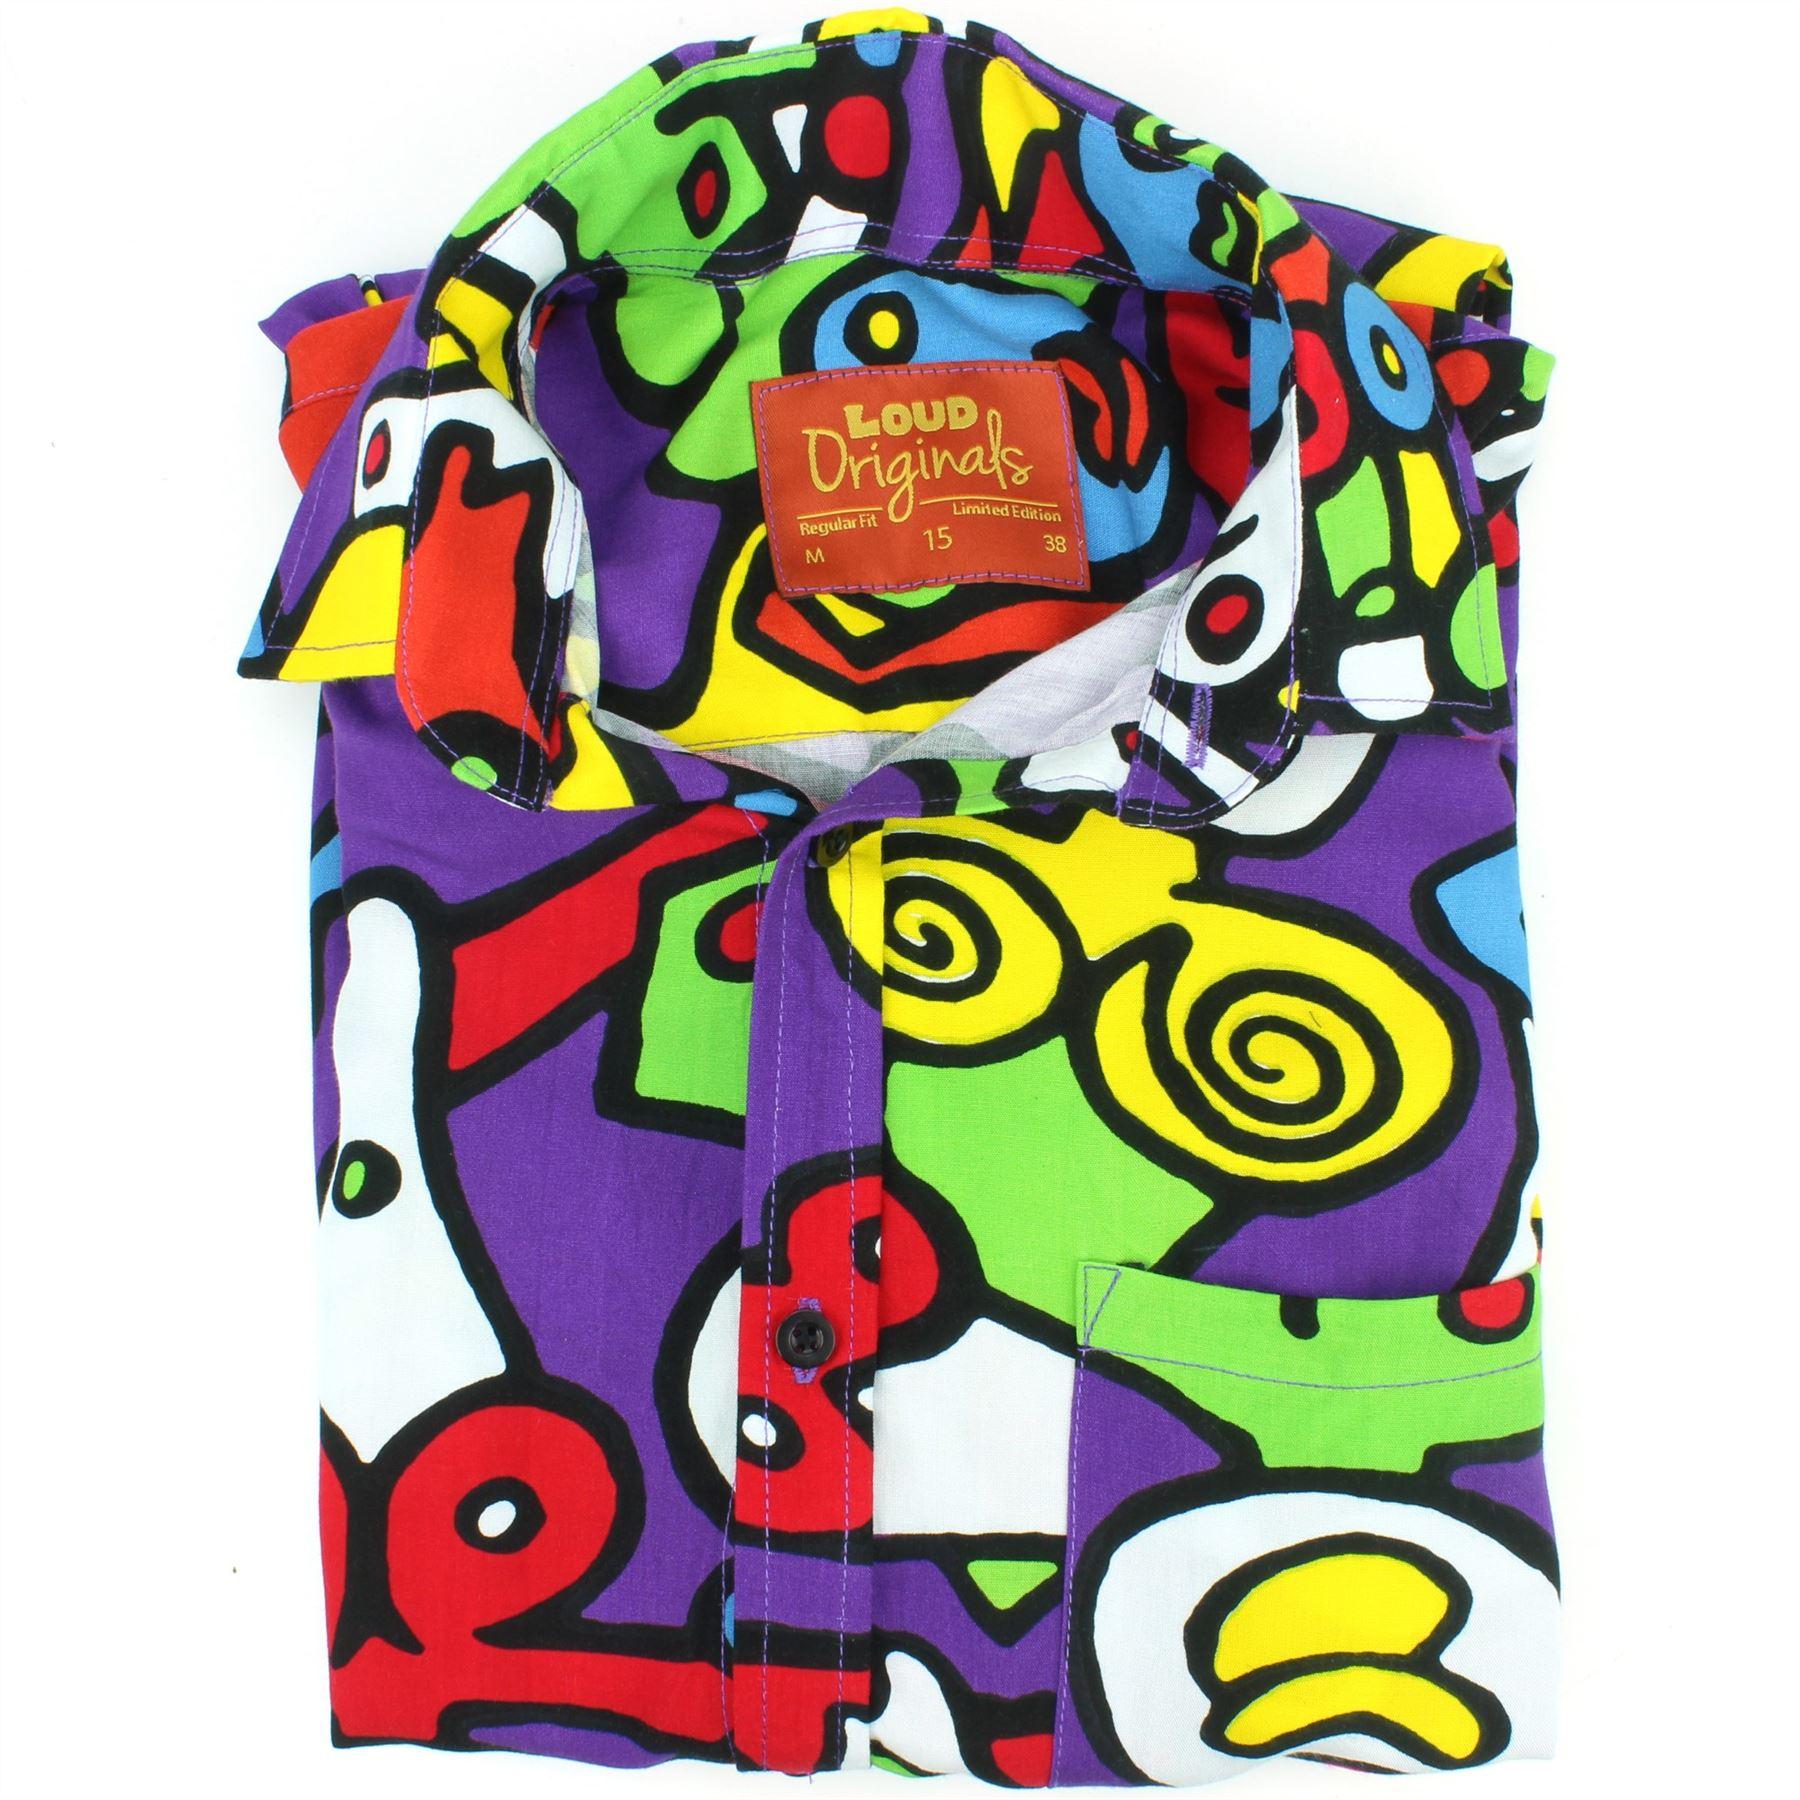 Mens-Shirt-Loud-Originals-Rayon-REGULAR-FIT-Long-Sleeve-TIFFY-PRINT-Retro-Dance thumbnail 12